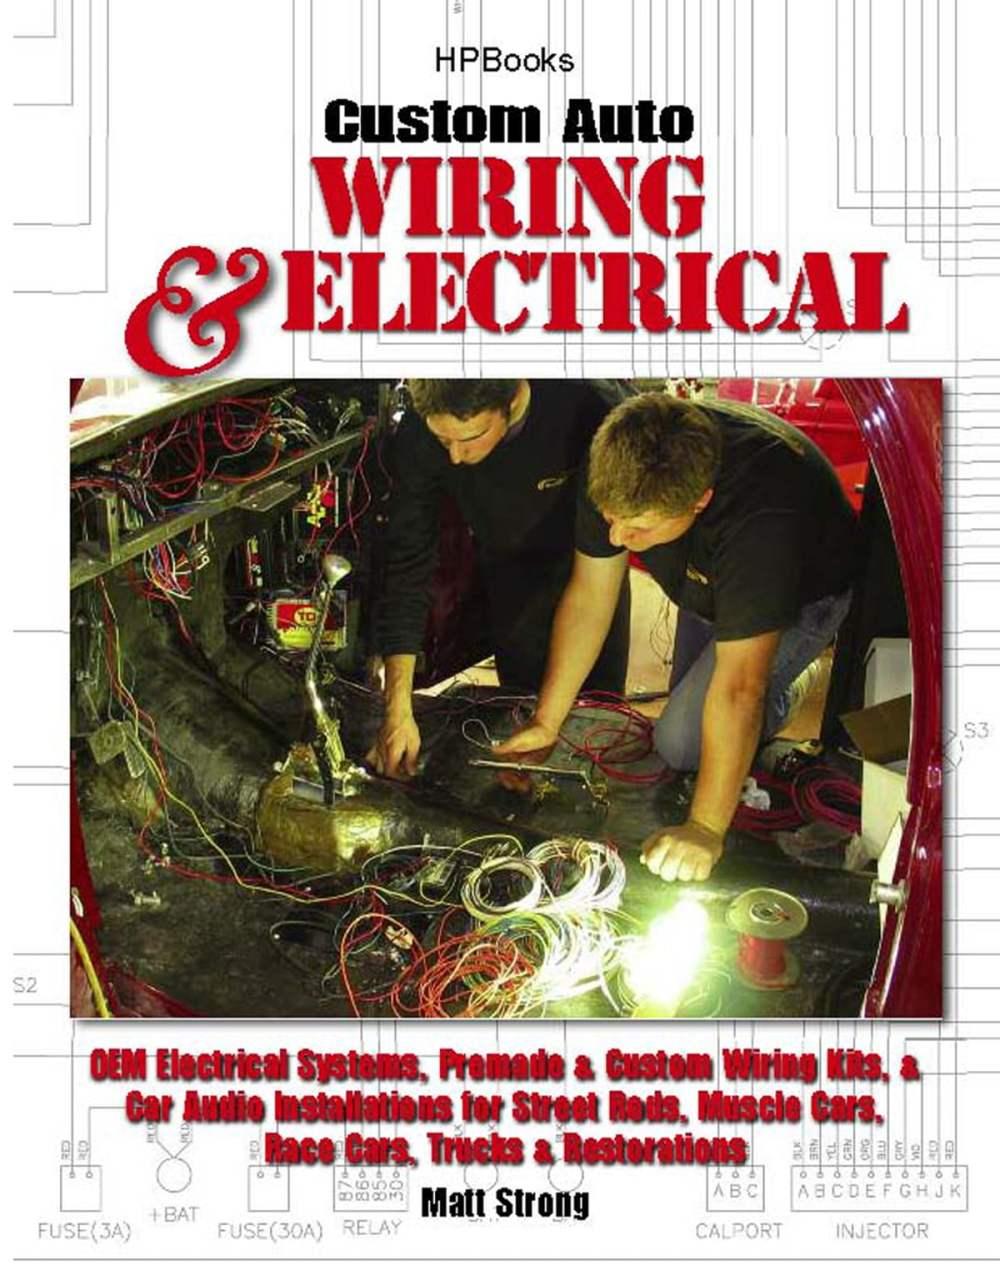 medium resolution of custom auto wiring electrical hp1545 ebook by matt strong 9781101046289 rakuten kobo